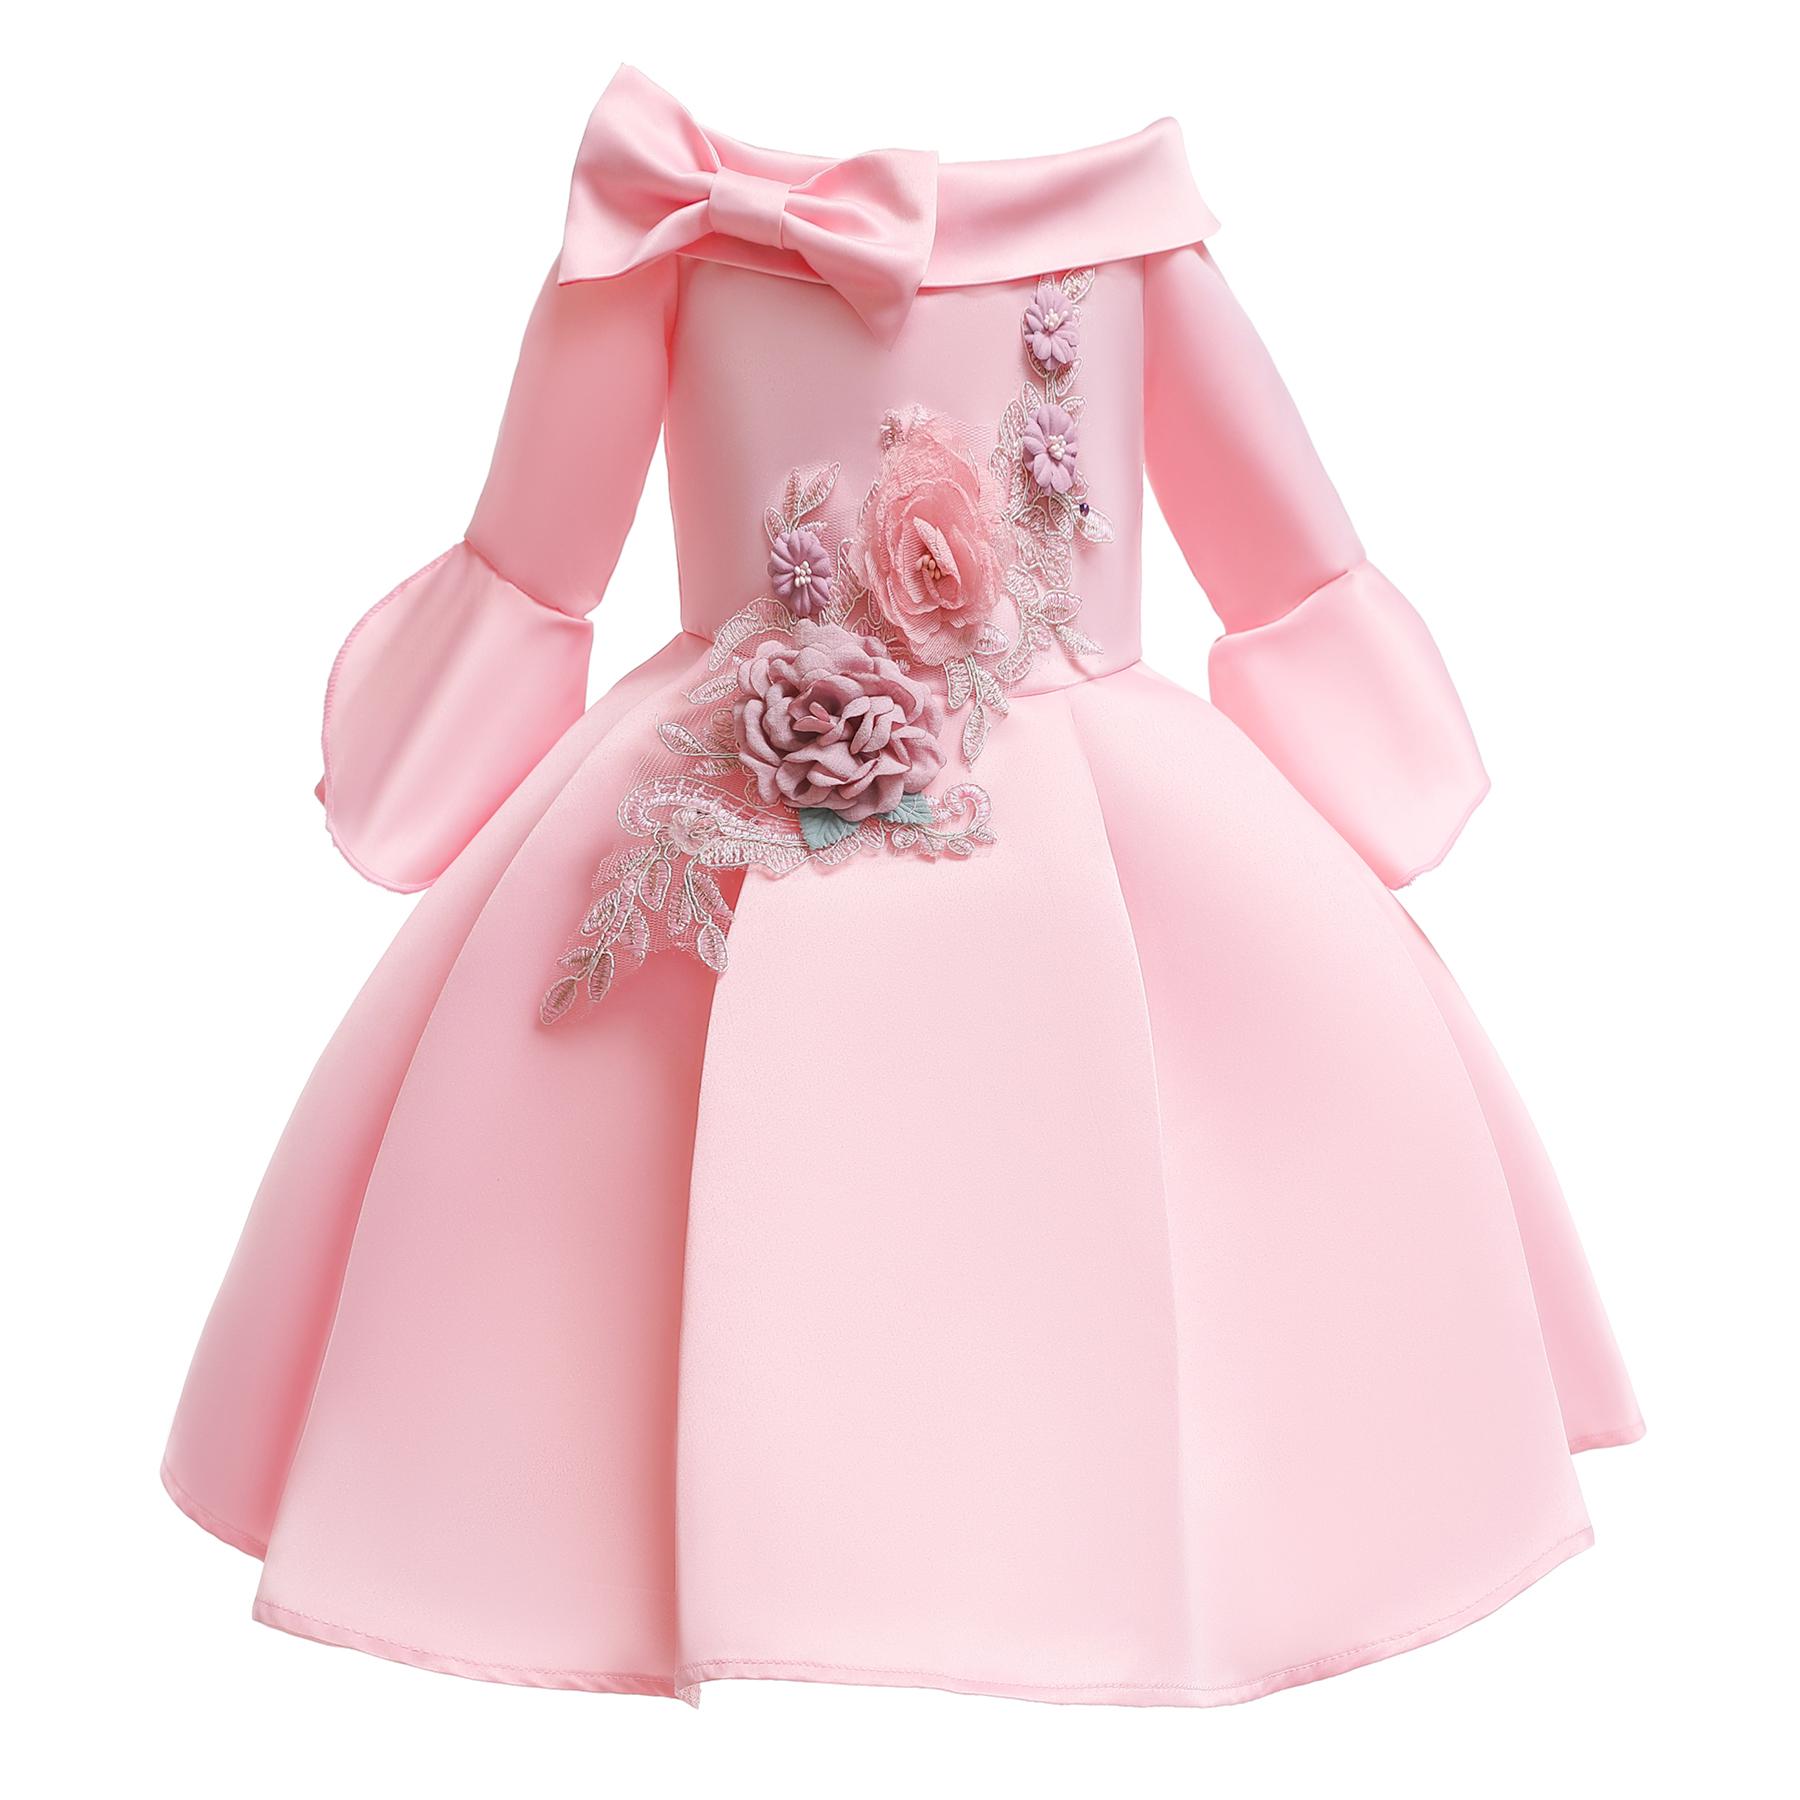 O-neck children tutu dress leakage shoulder design girl dress of 3-8 years old фото